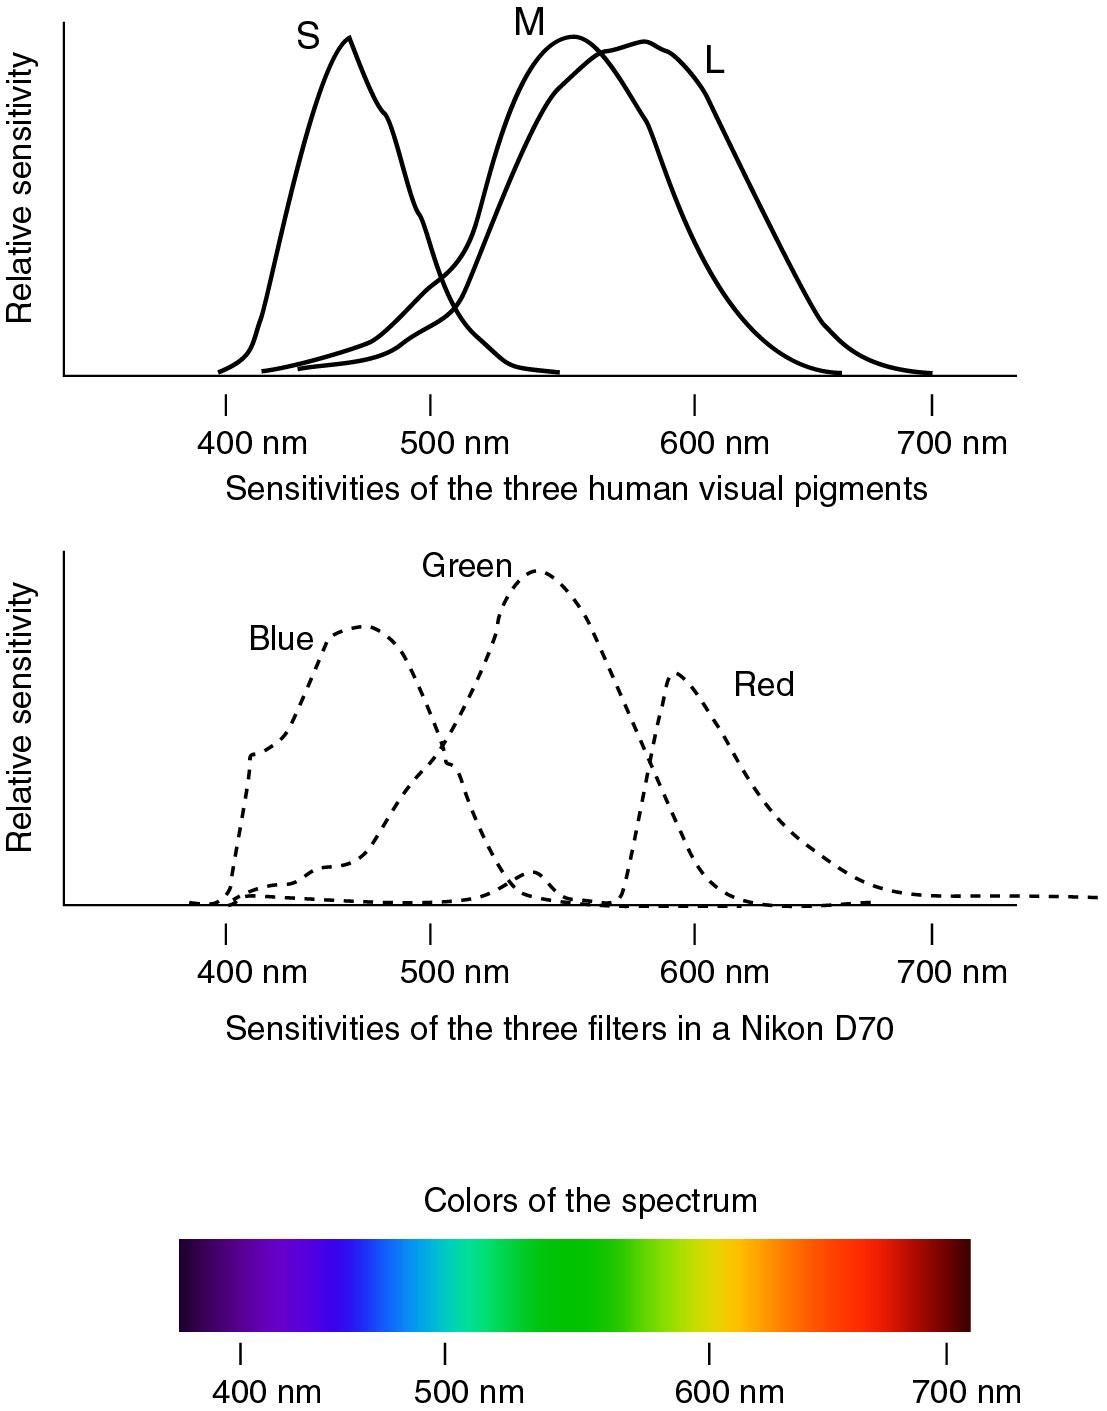 Sensing Violet The Human Eye And Digital Cameras